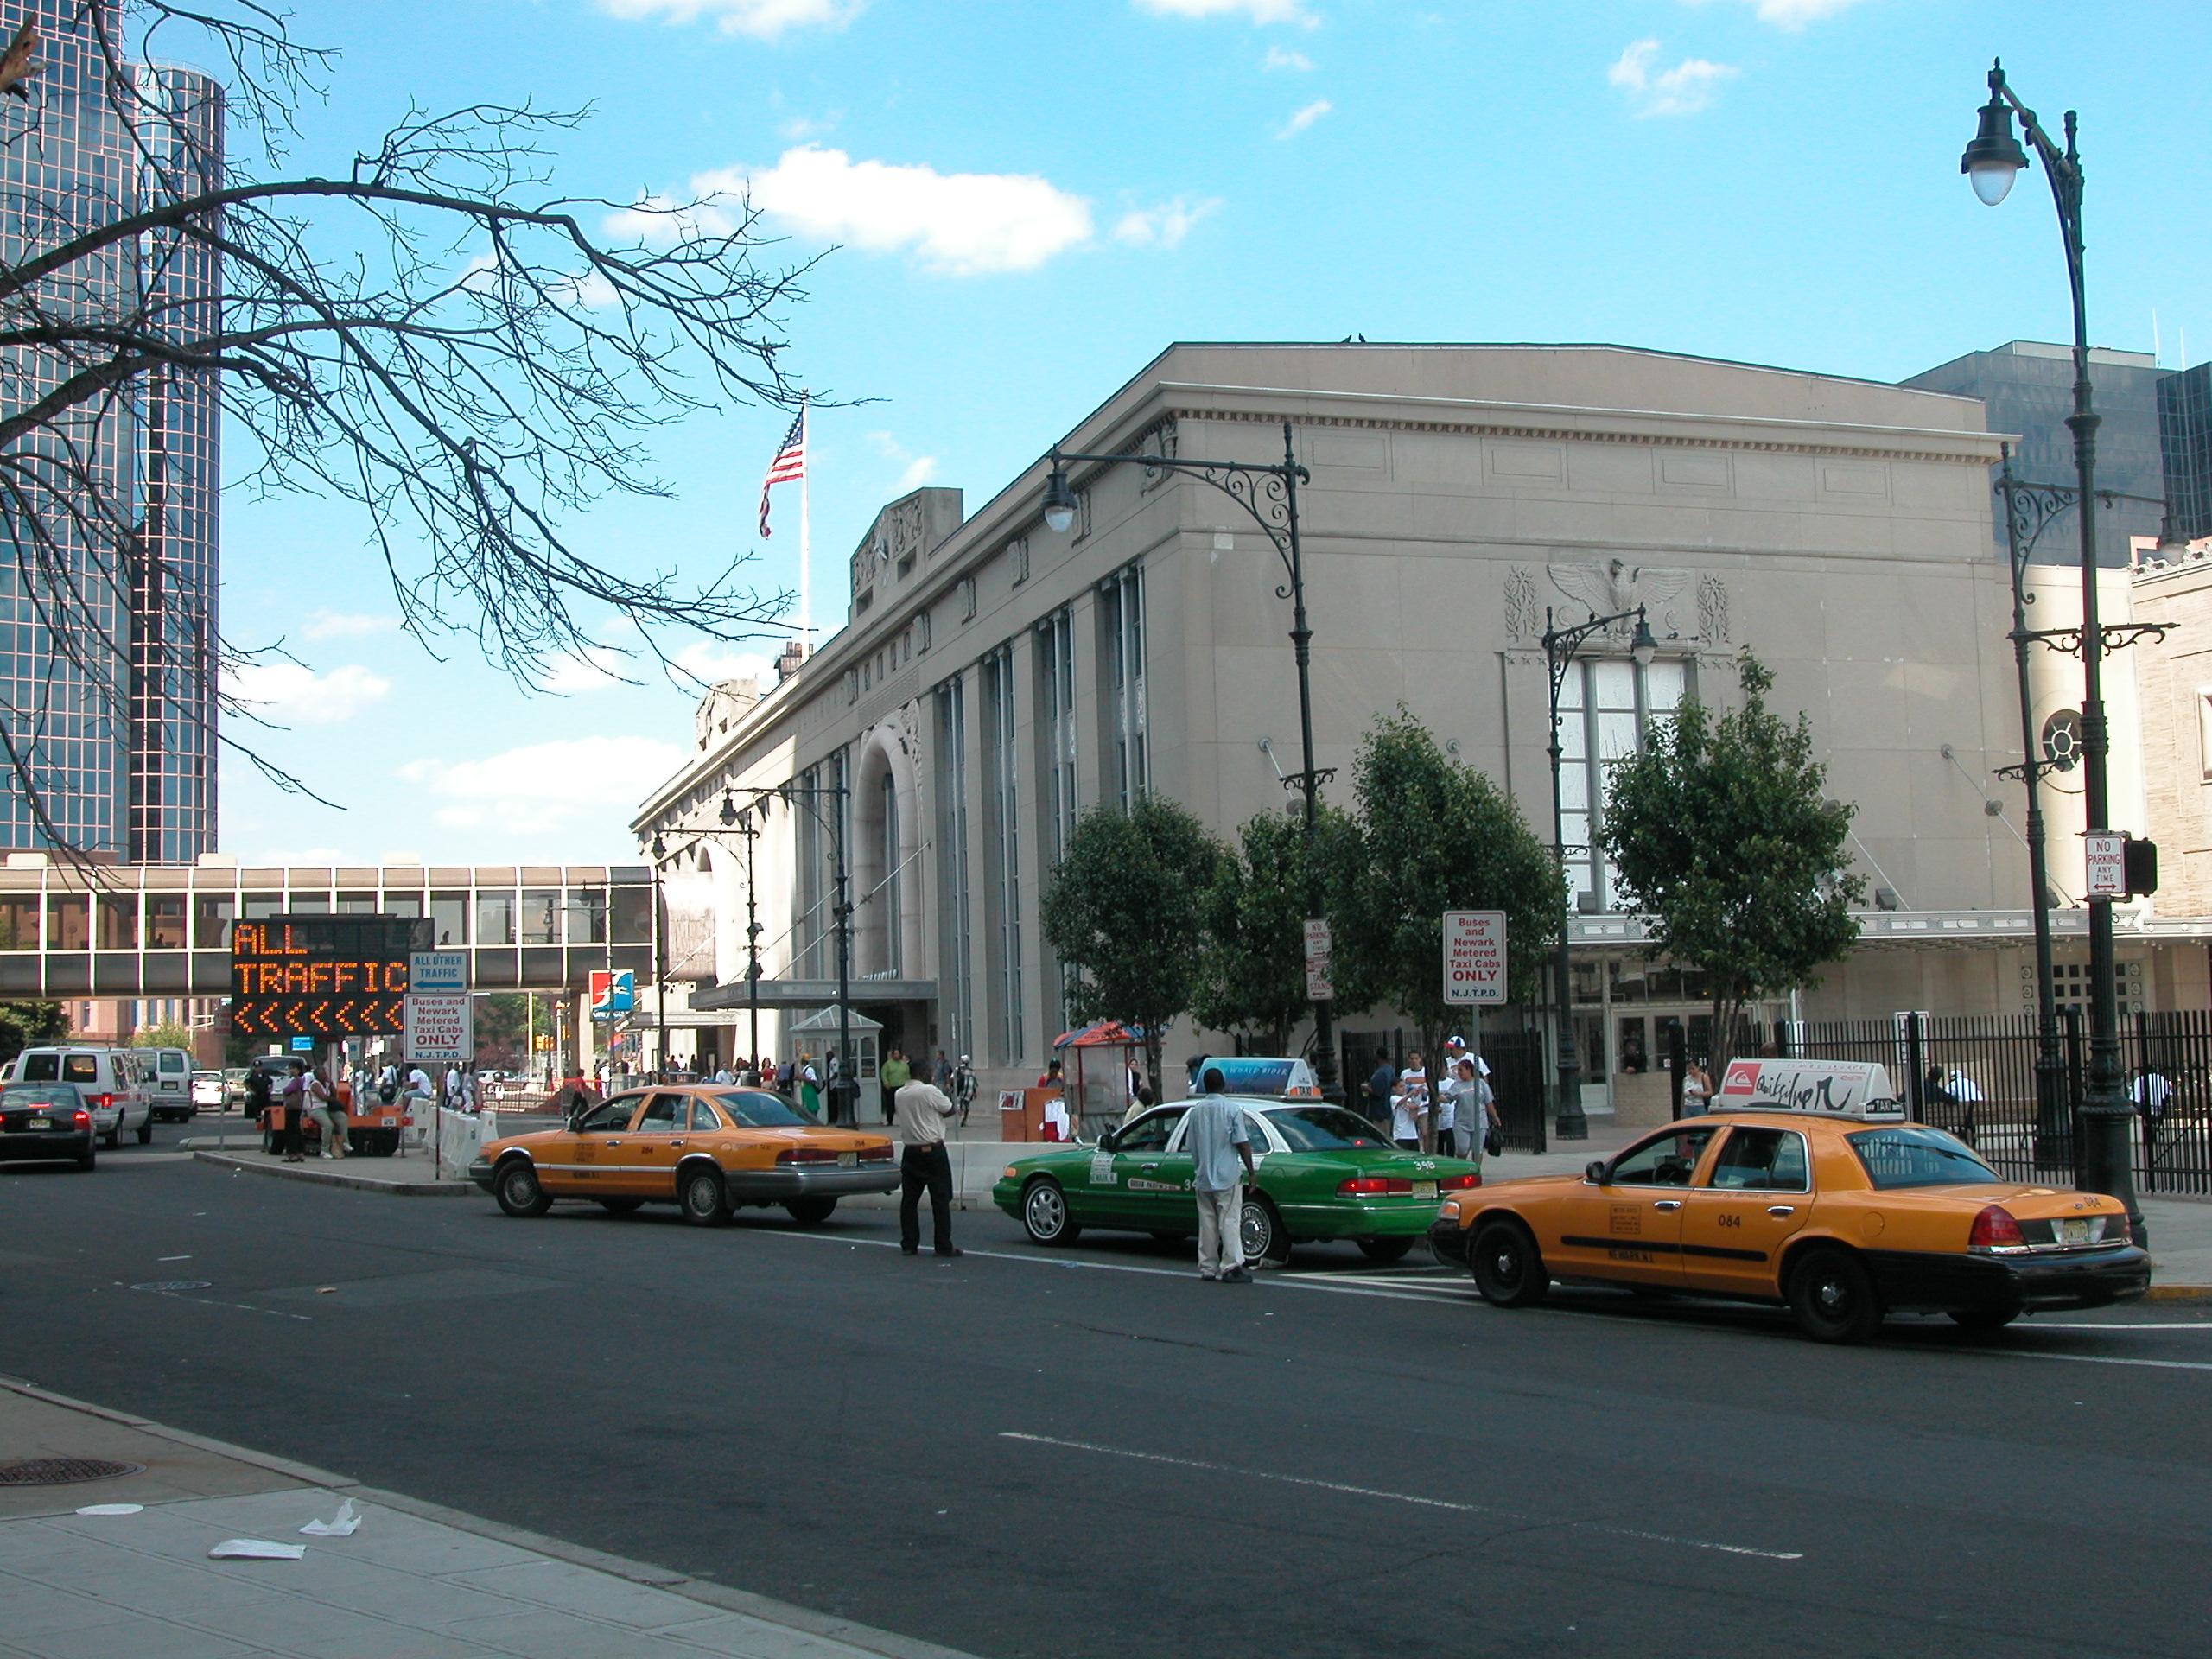 Penn Station Newark Nj To Long Island